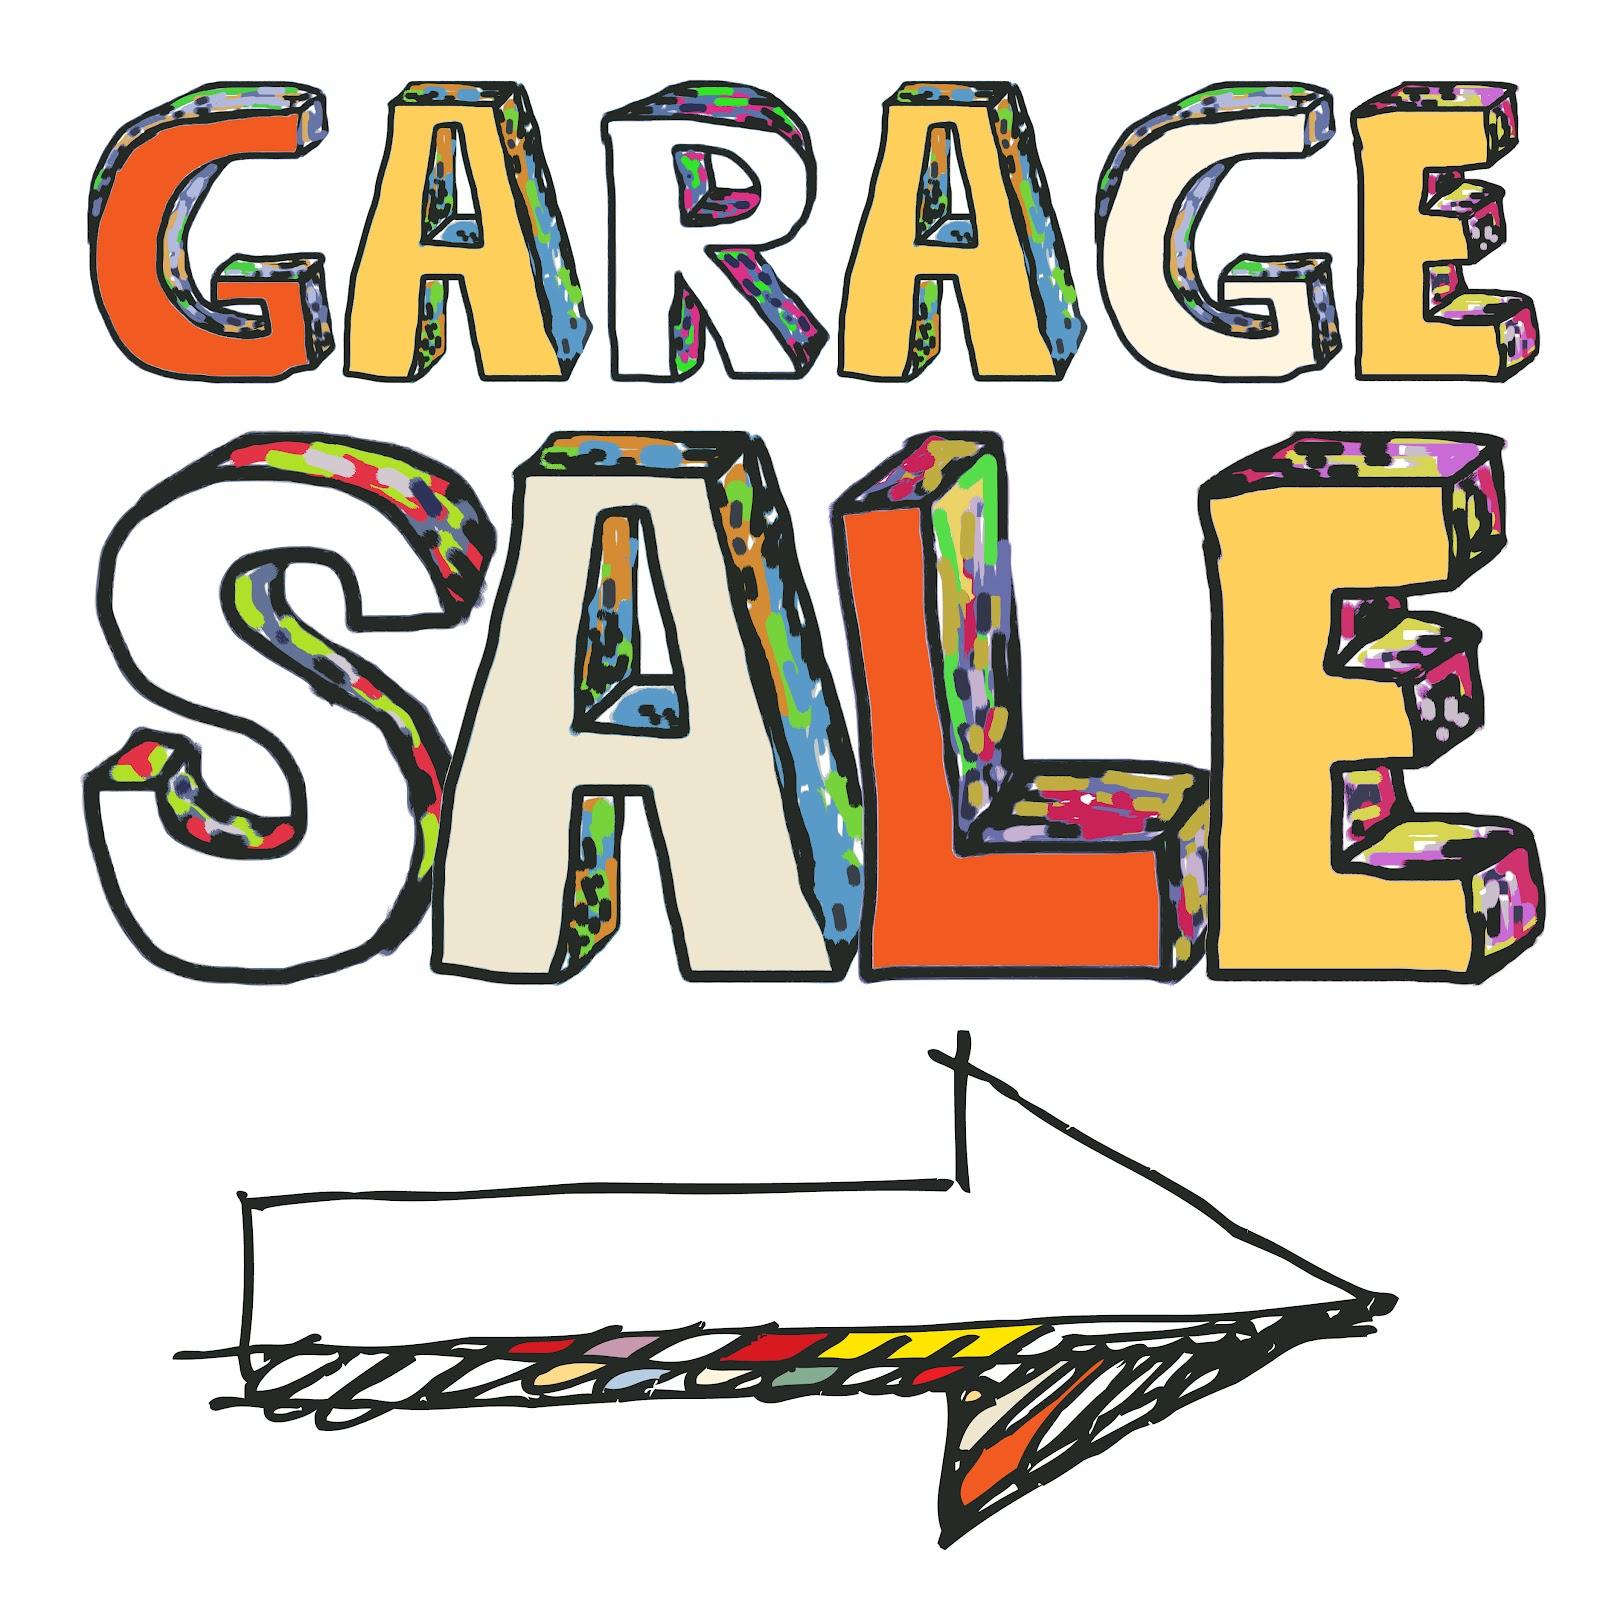 1600x1600 Free Clipart Yard Sale